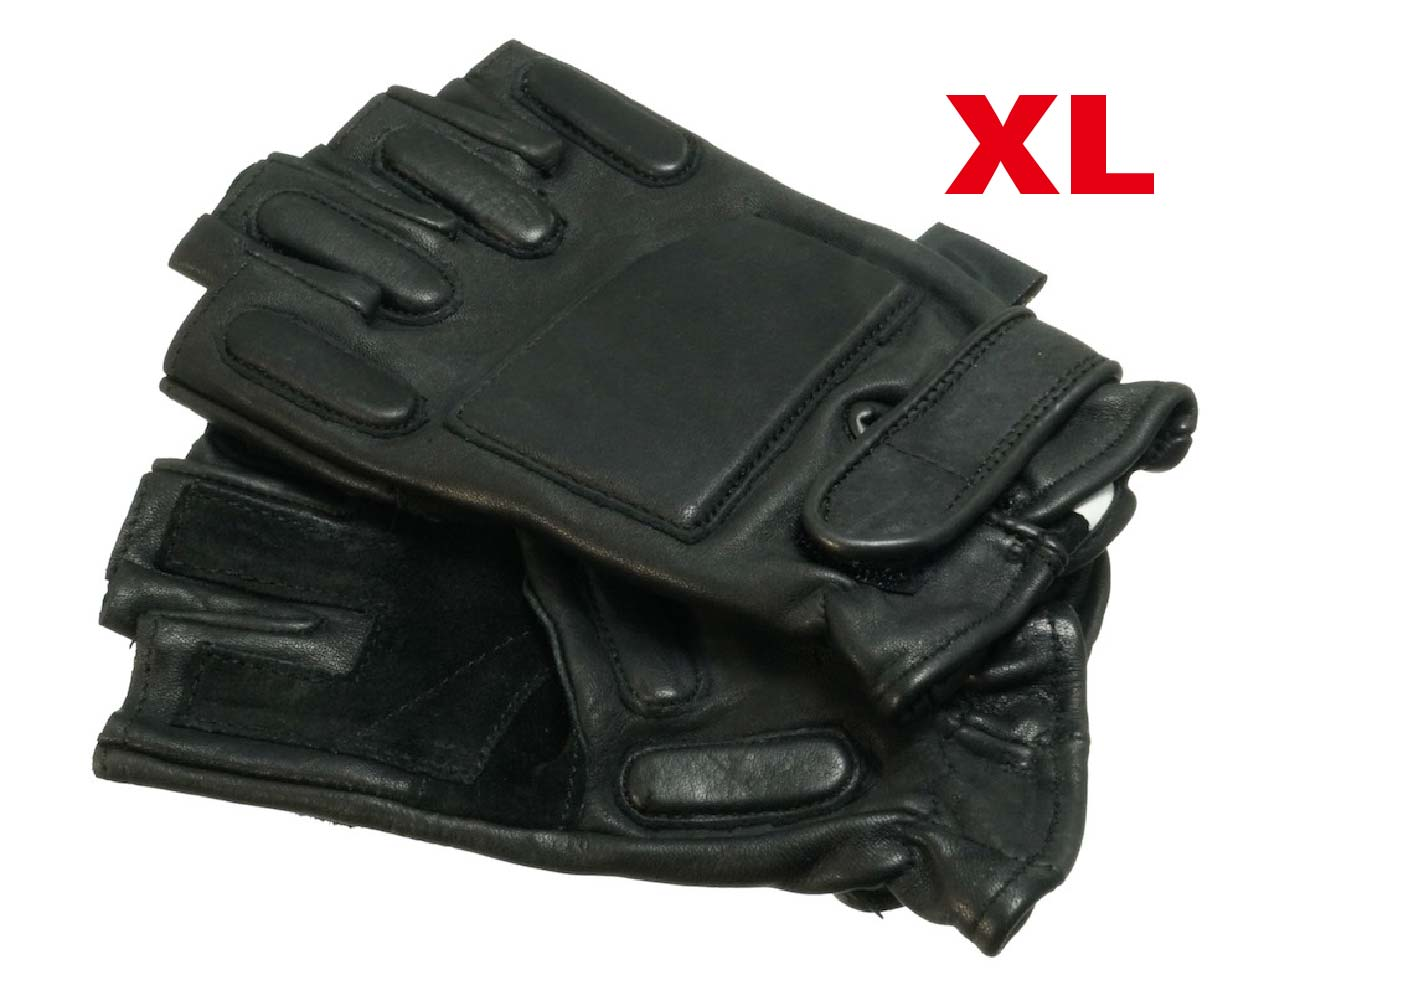 MIL-FORCE ミルフォース SWATレザーグラブ ハーフ(XLサイズ)  PG-01A-XL